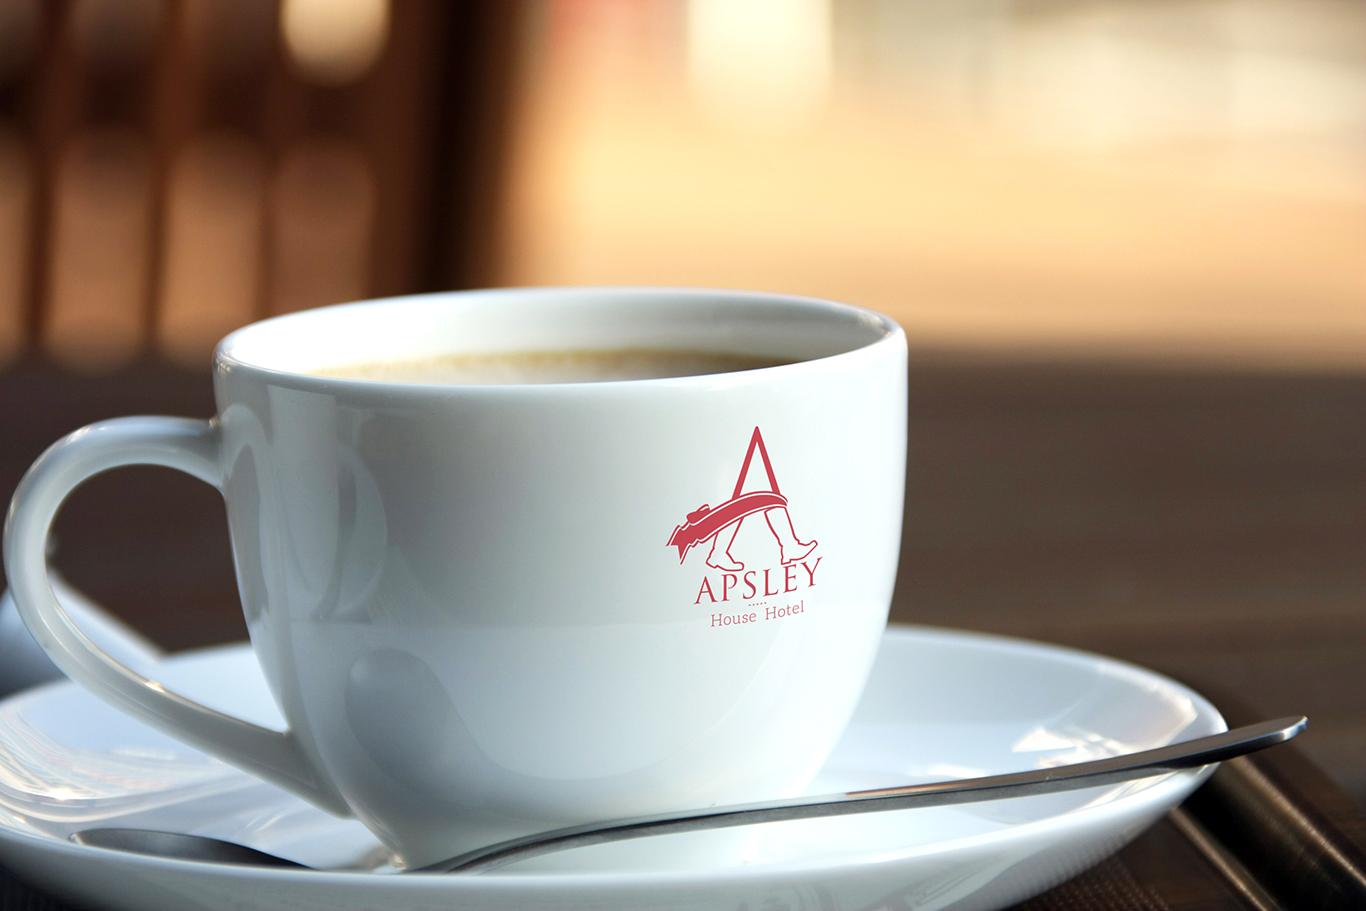 Apsley House Hotel